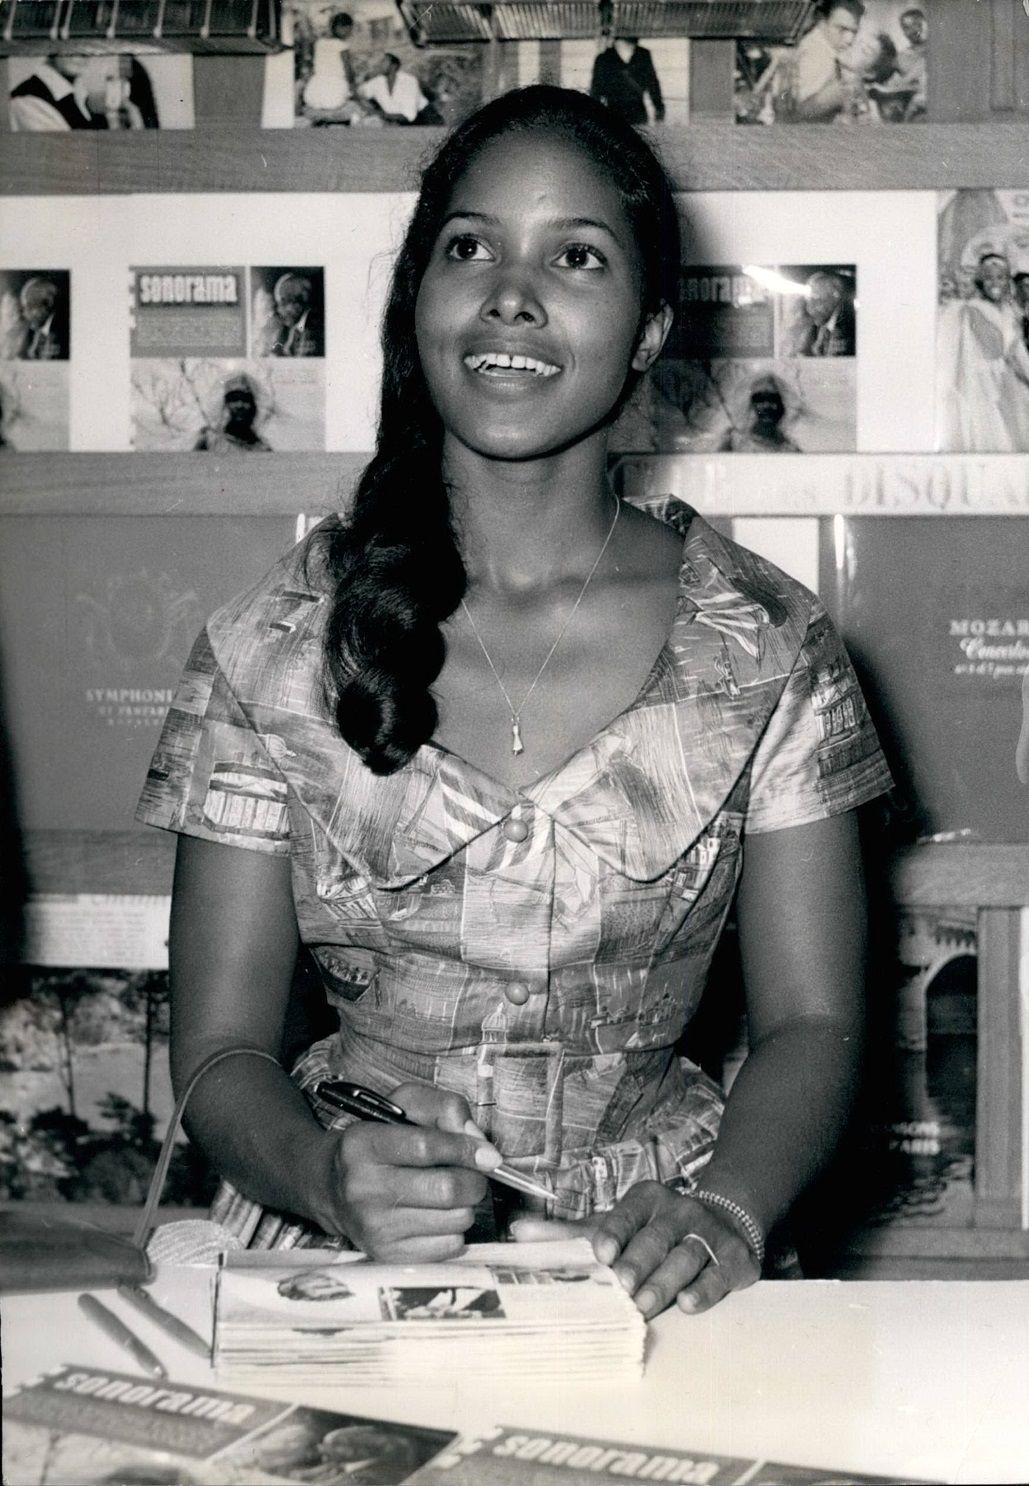 Bibbe Hansen,Patricia McPherson XXX pics & movies Bree Williamson,Barbara Baxley